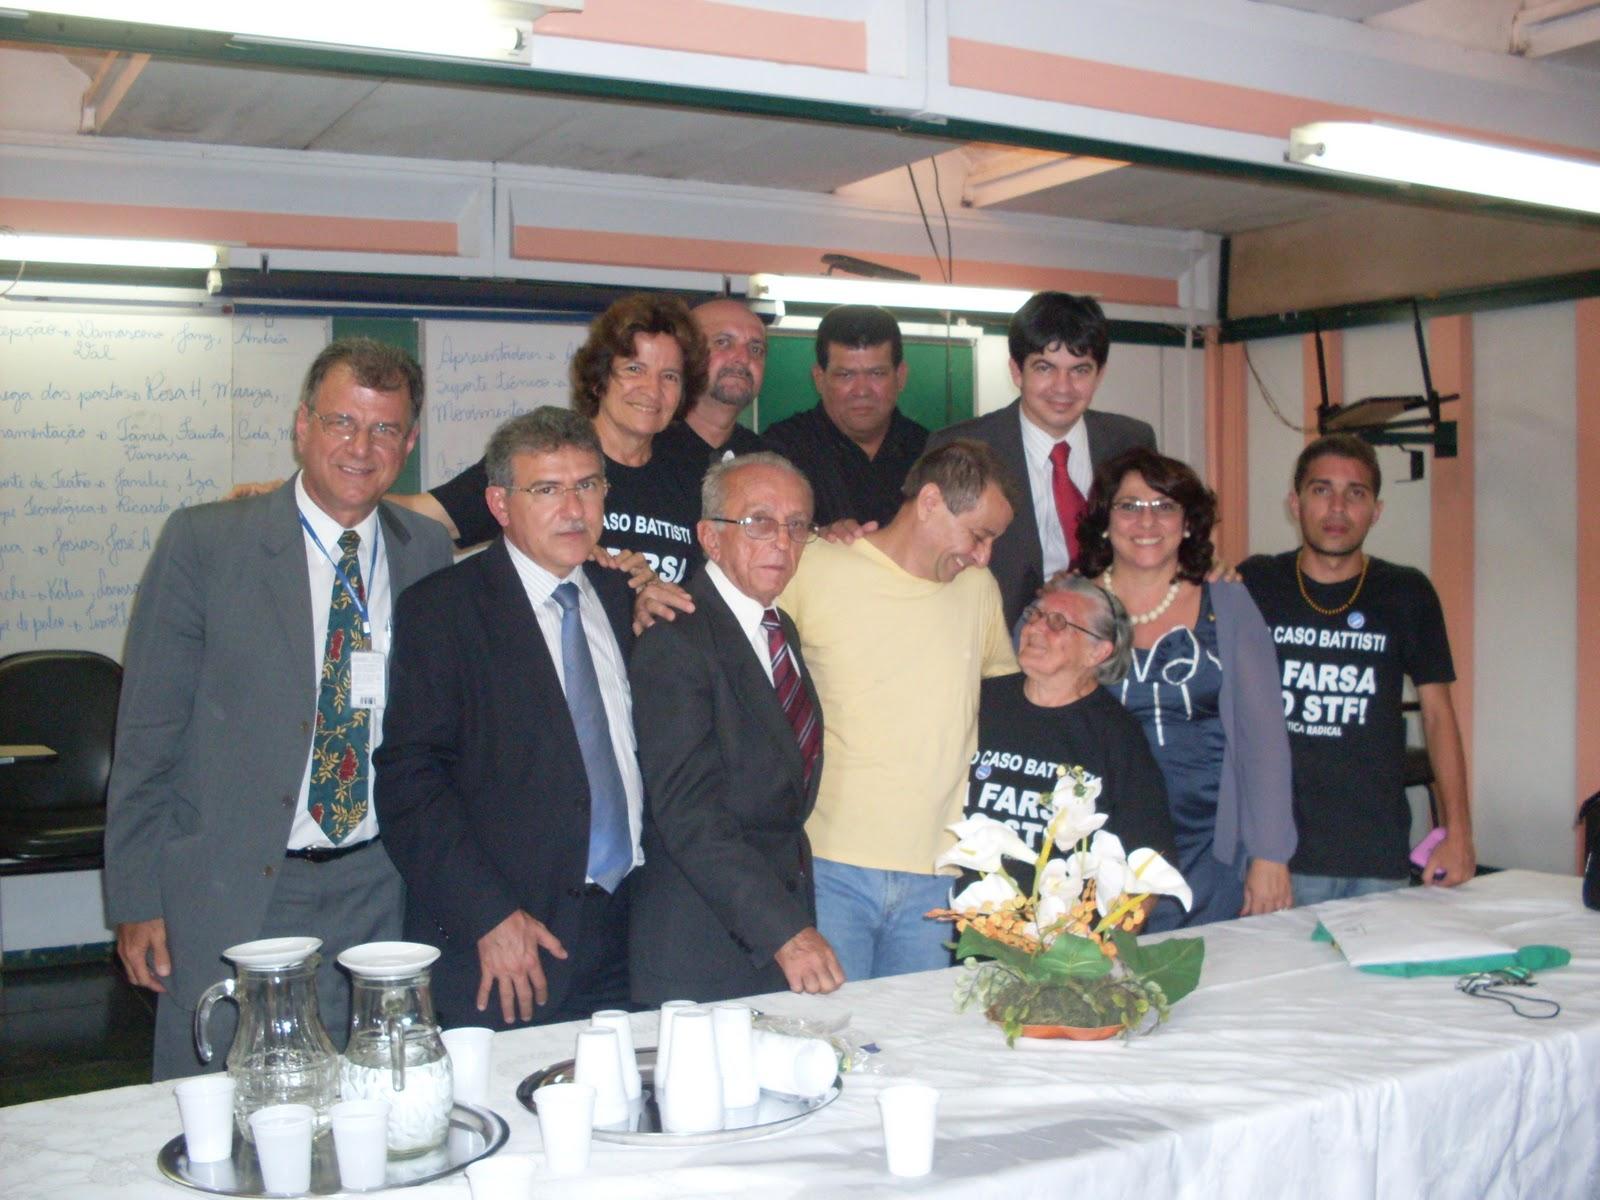 Battisti recebe apoio do PSOL